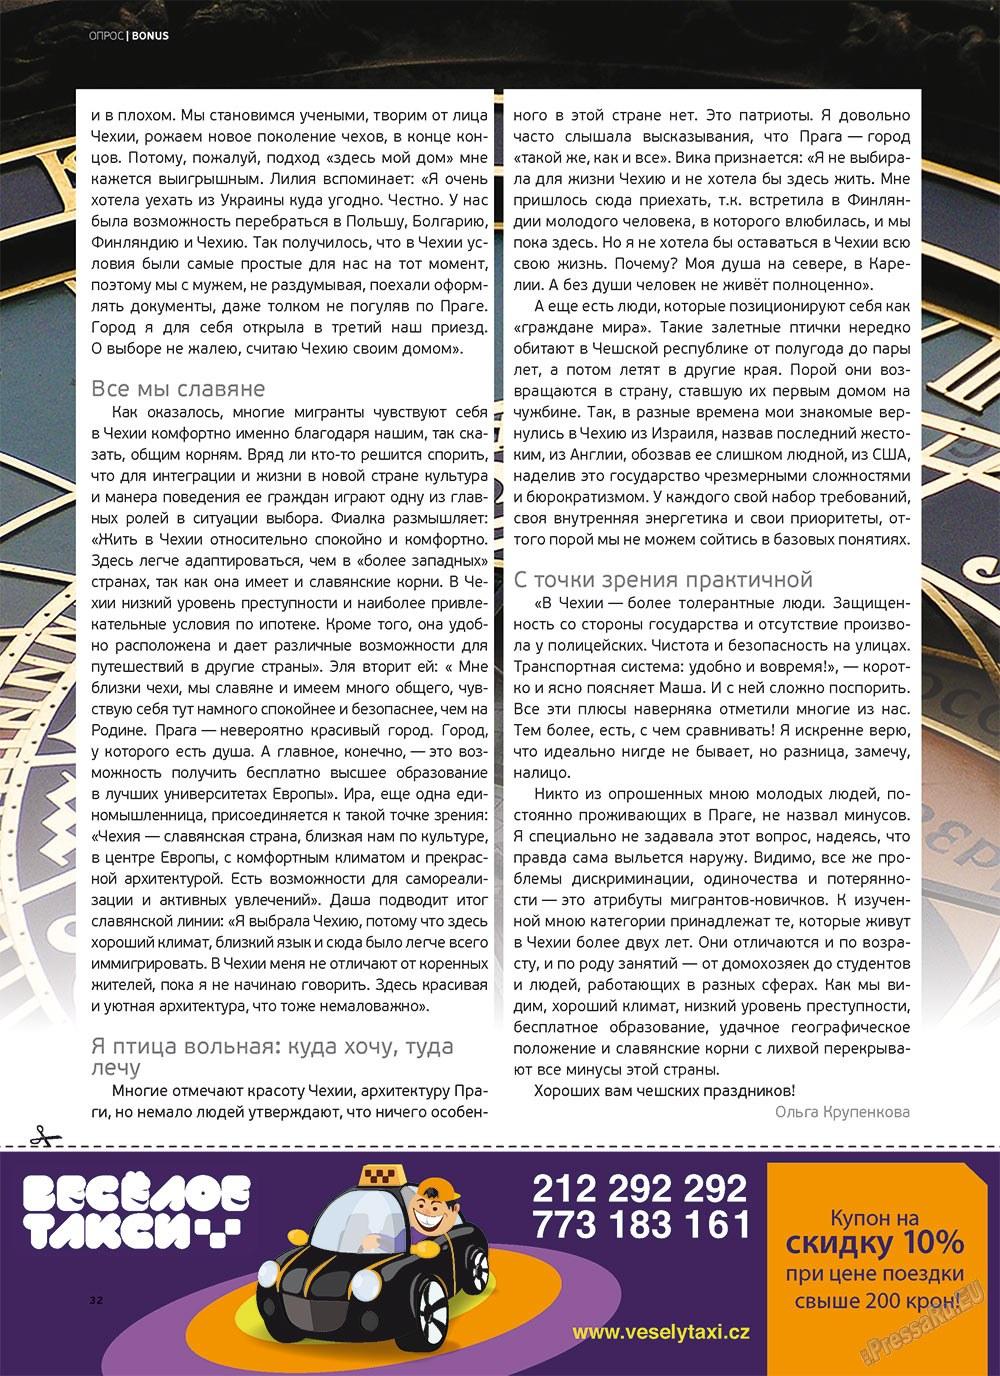 Артек (журнал). 2011 год, номер 5, стр. 34